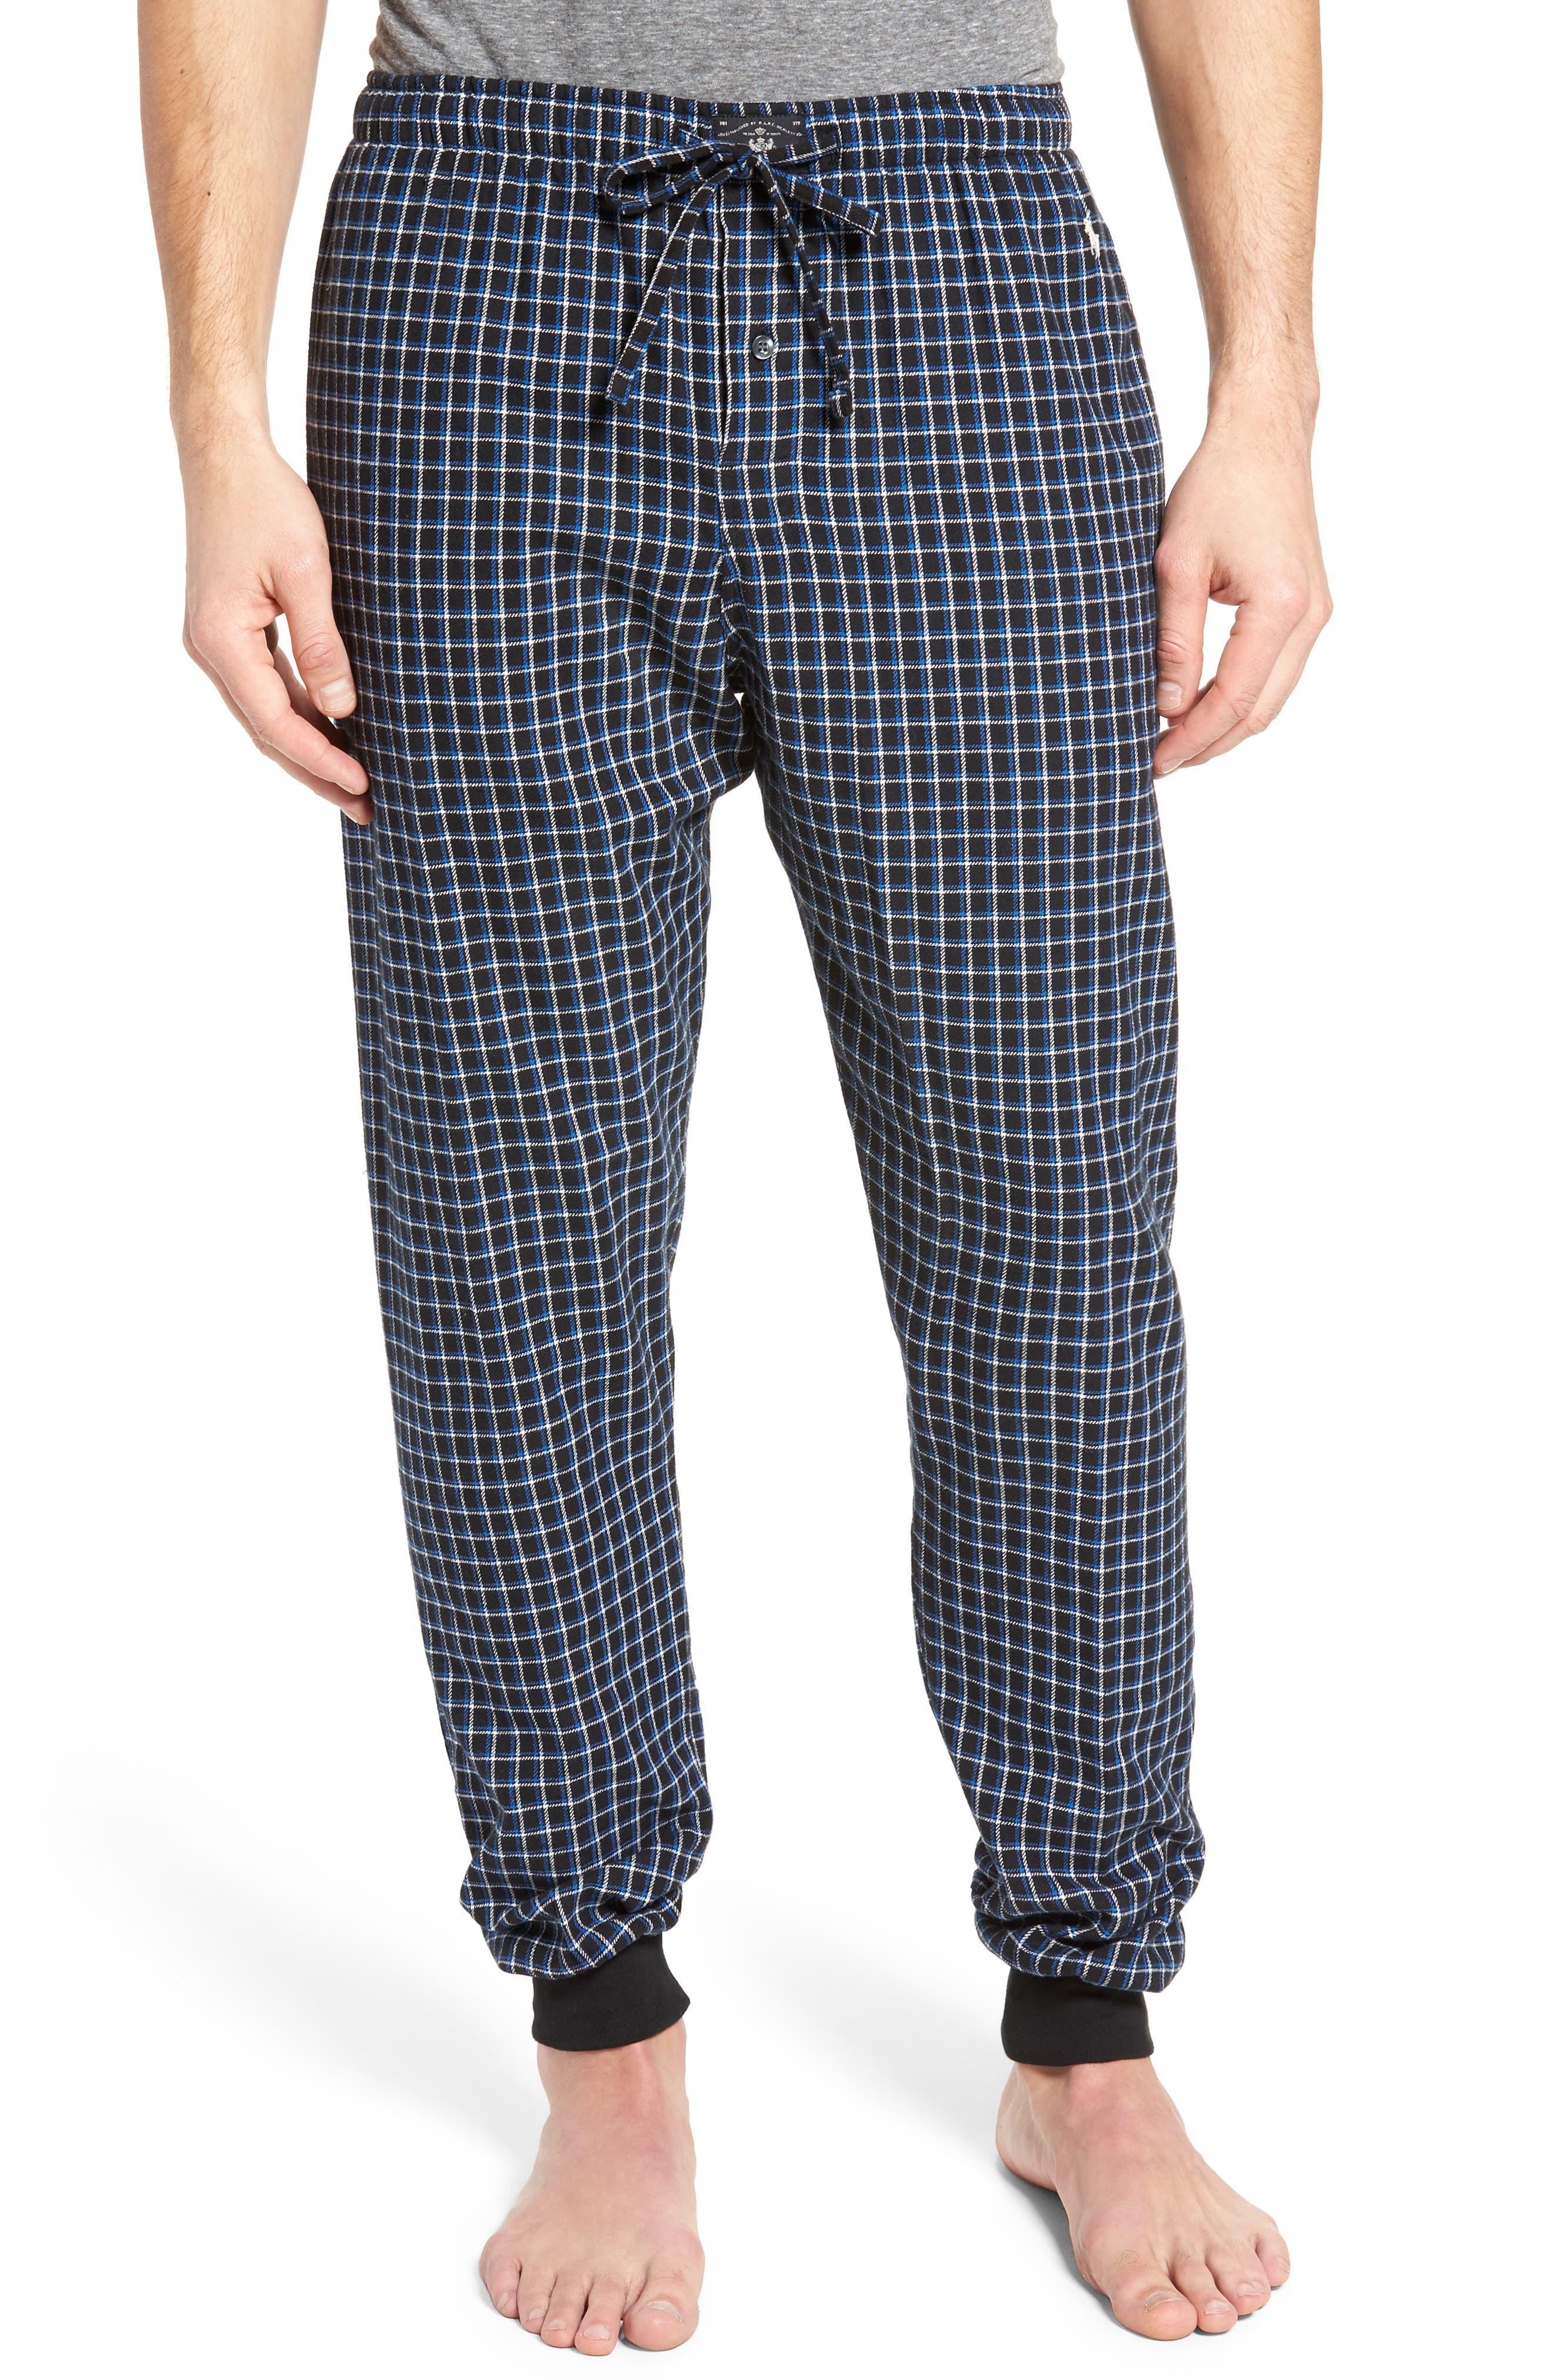 Flannel Pajama Jogger Pants,                             Main thumbnail 1, color,                             Logan Plaid/ Crescent Cream